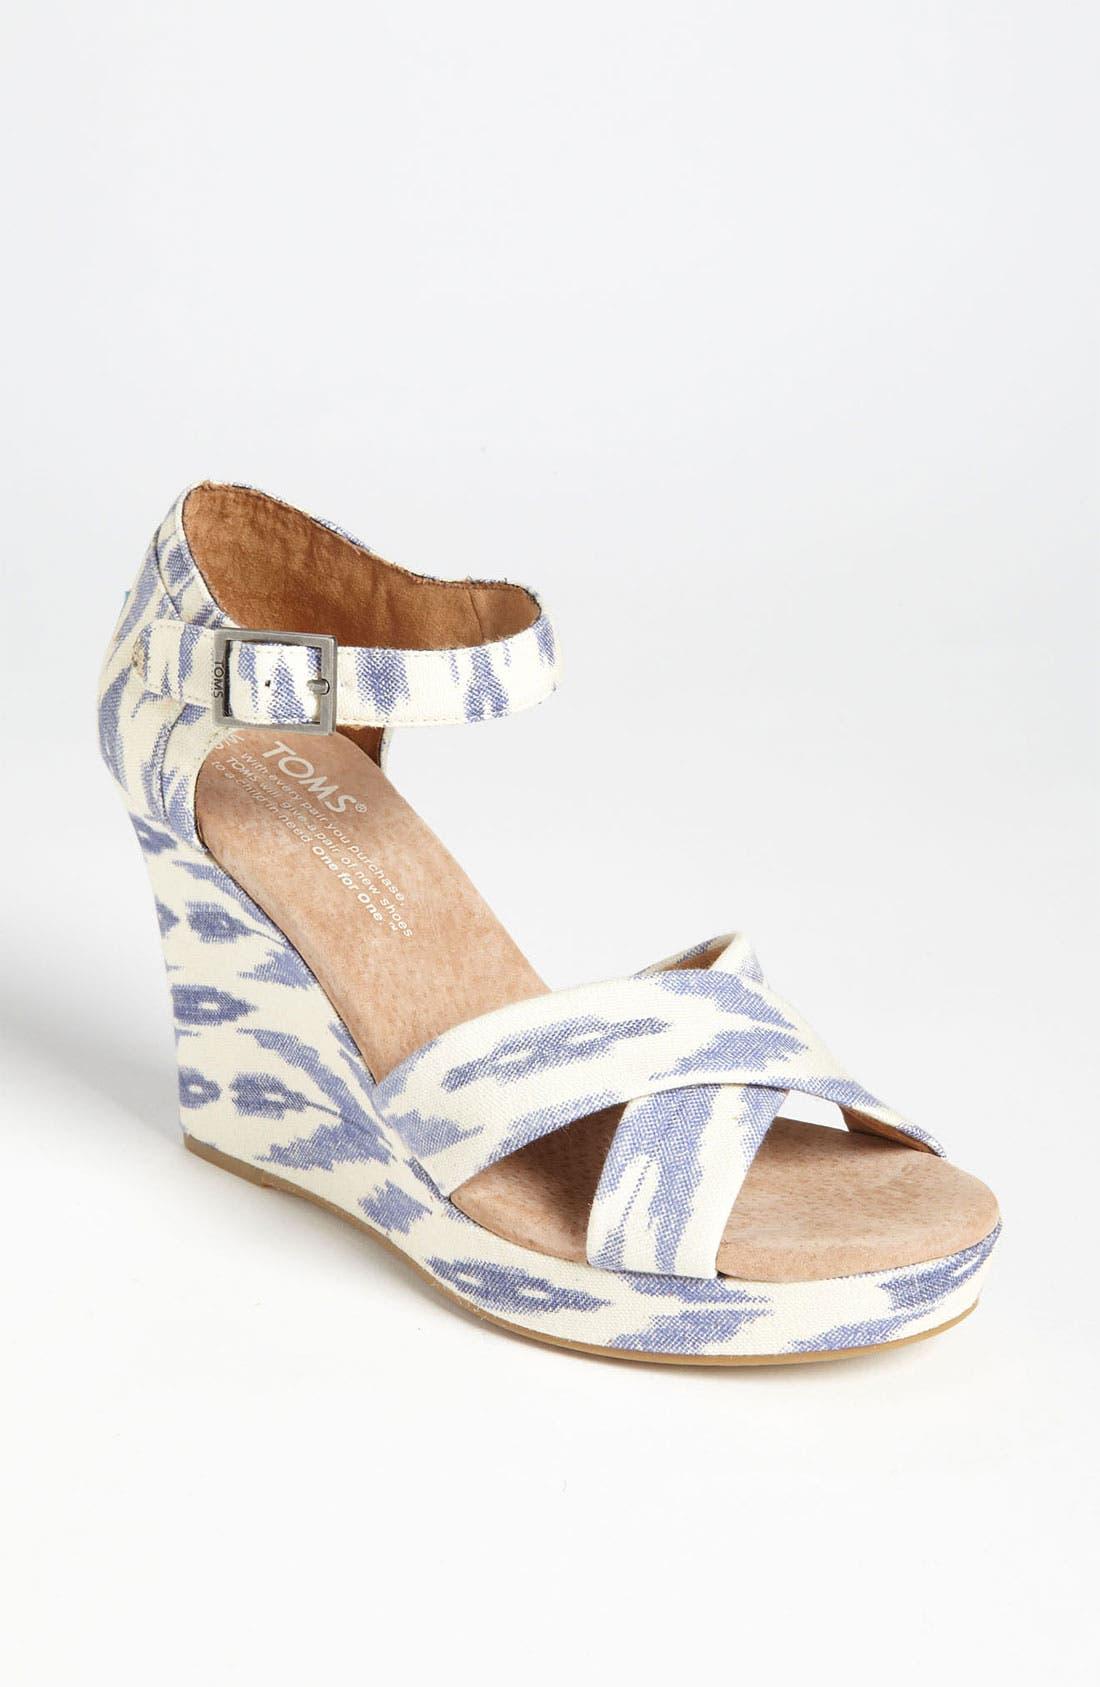 Alternate Image 1 Selected - TOMS 'Ikat' Wedge Sandal